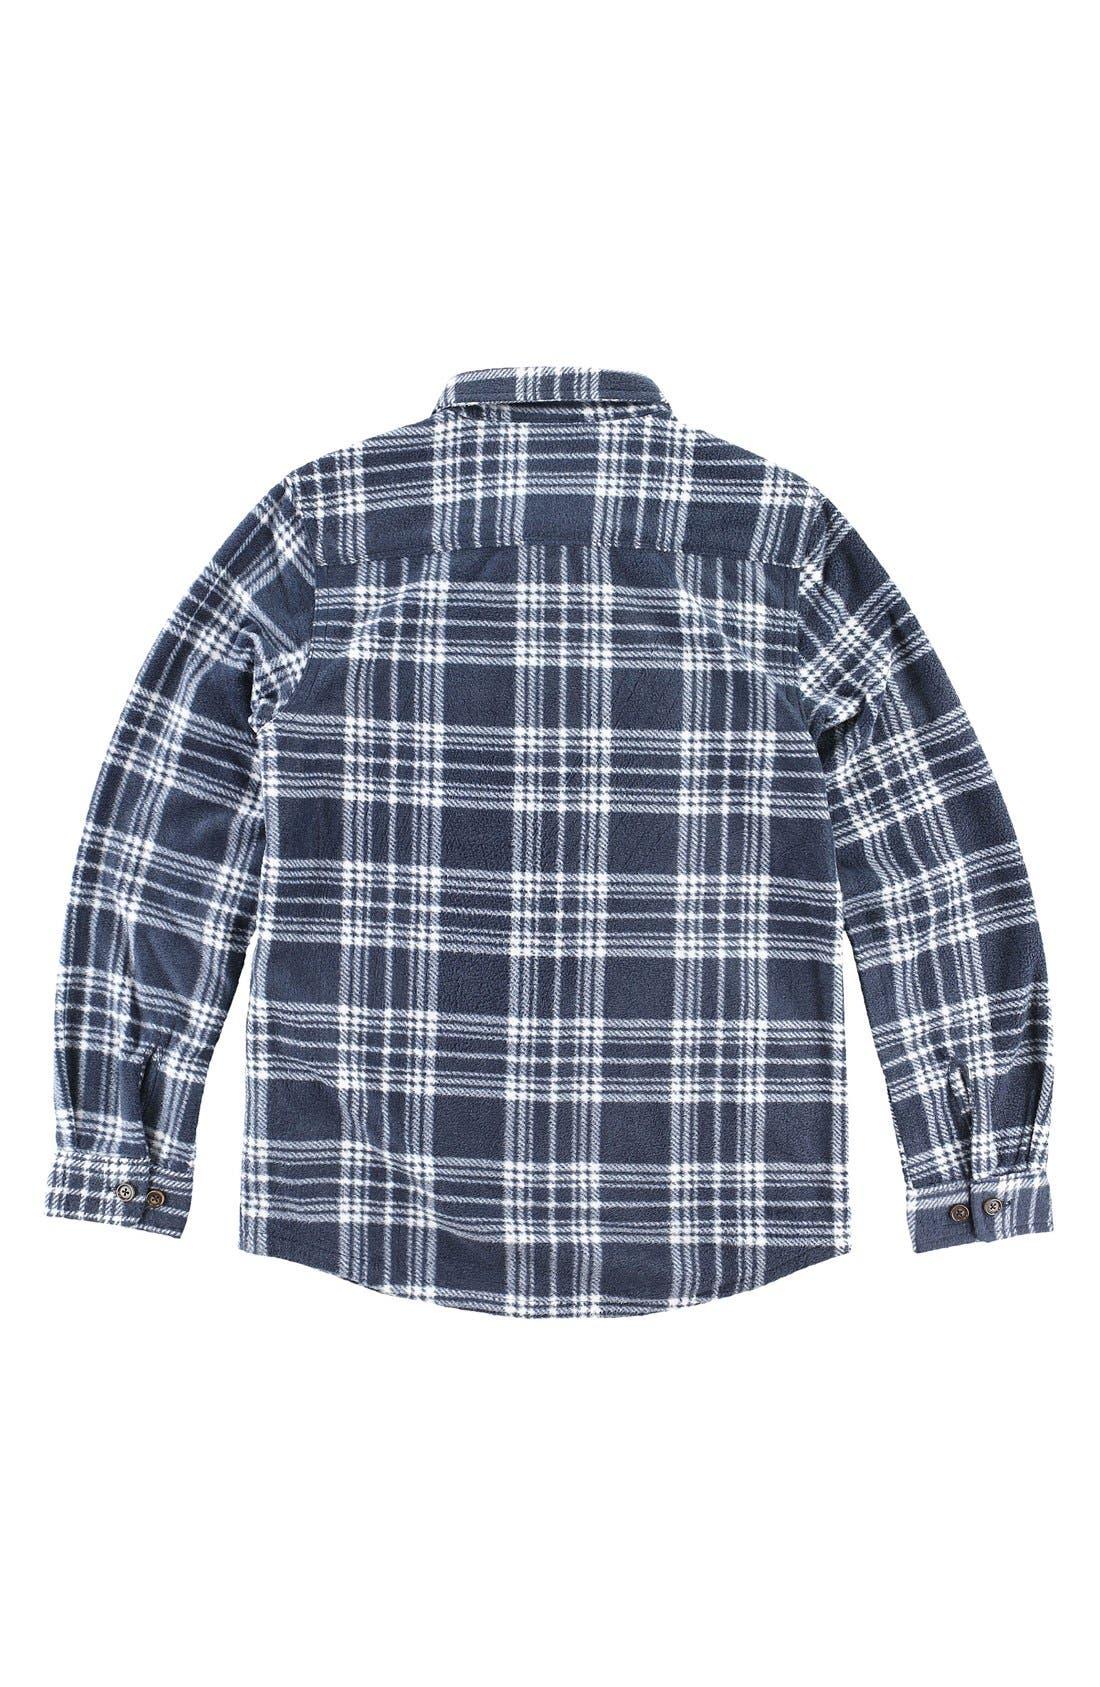 Alternate Image 2  - O'Neill 'Glacier' Check Long Sleeve Fleece Shirt (Big Boys)